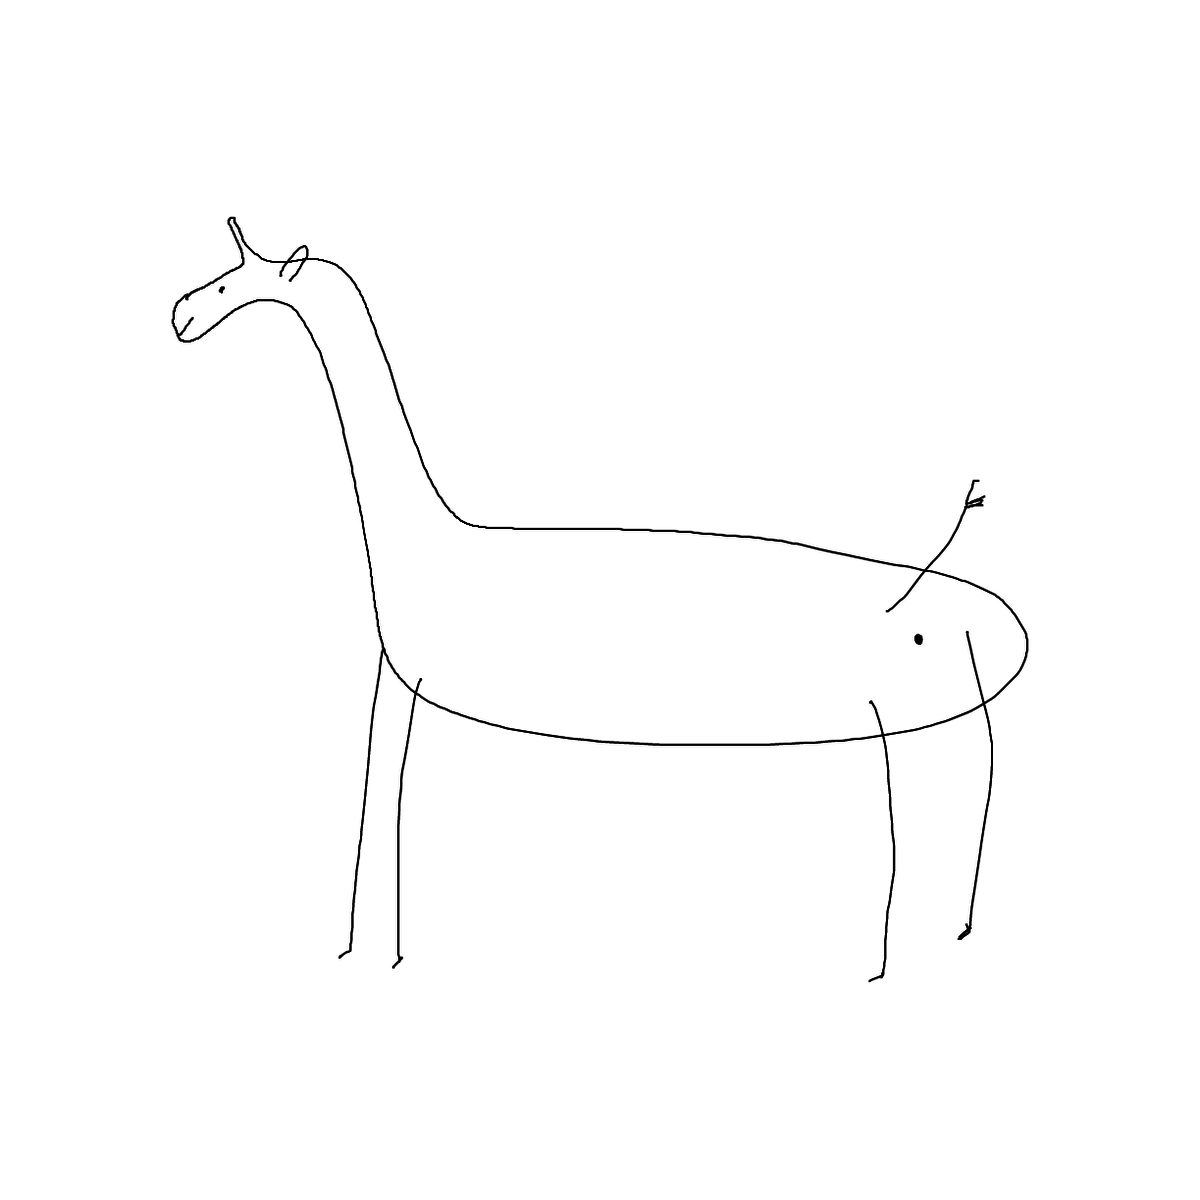 BAAAM drawing#5906 lat:52.4749145507812500lng: 13.4073505401611330